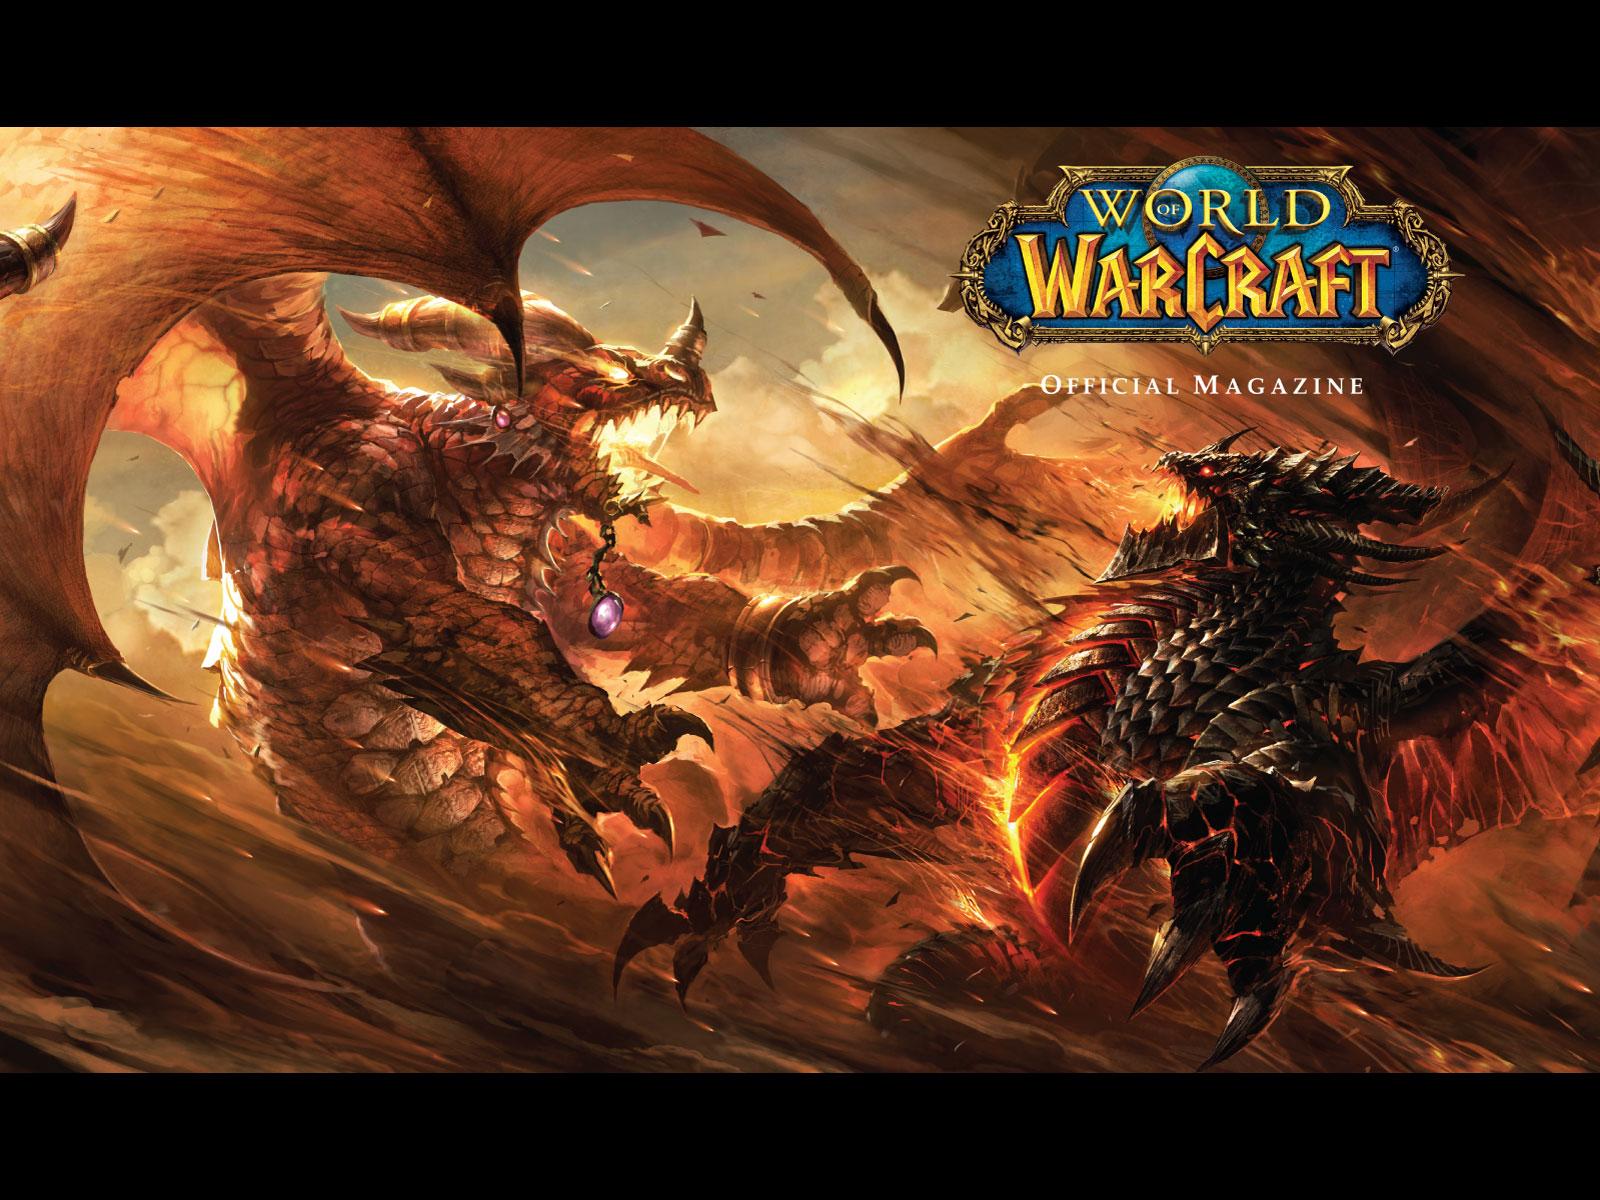 WoW: Cataclysm News Blog: Neue WoW: Cataclysm Artworks und ...  World Of Warcraft Cataclysm Wallpapers